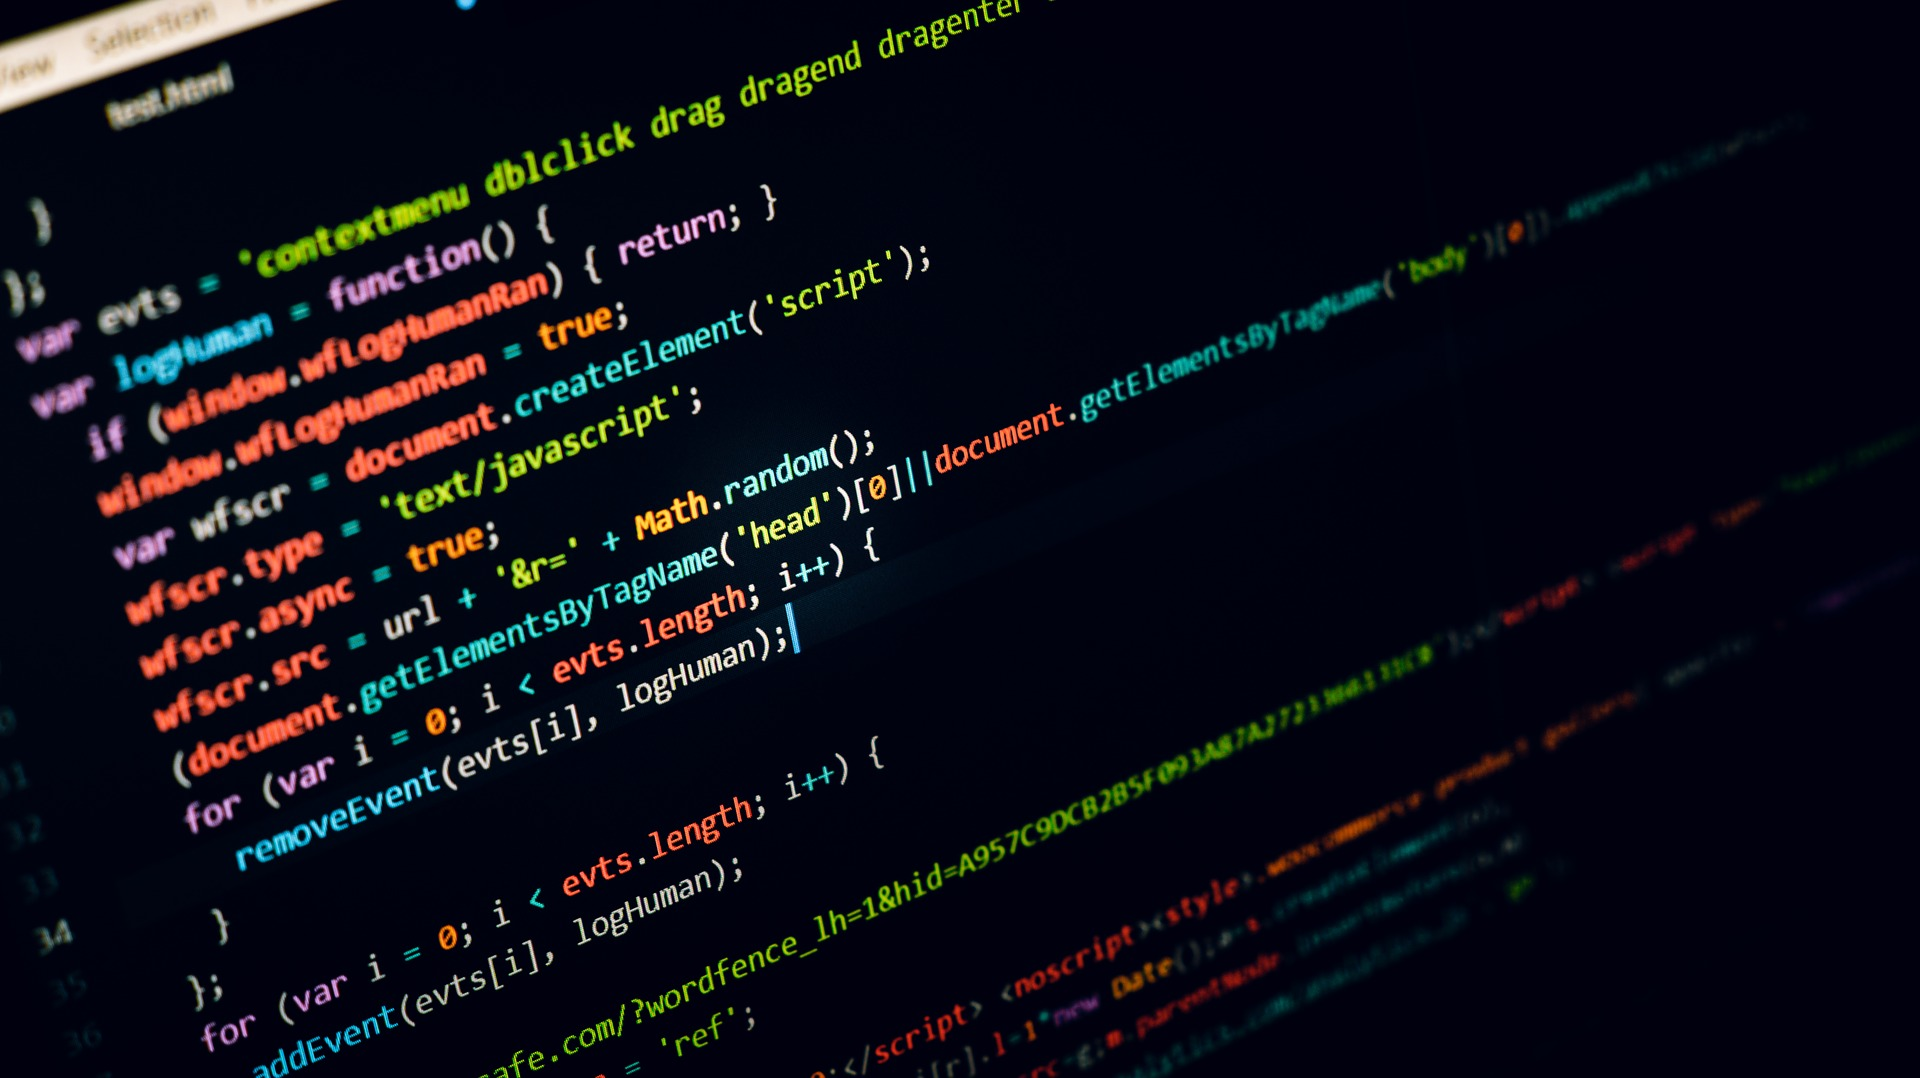 VB.NETでの配列の操作方法とは?初期化、サイズ変更、検索、ソート、ユニークの方法について紹介!サムネイル